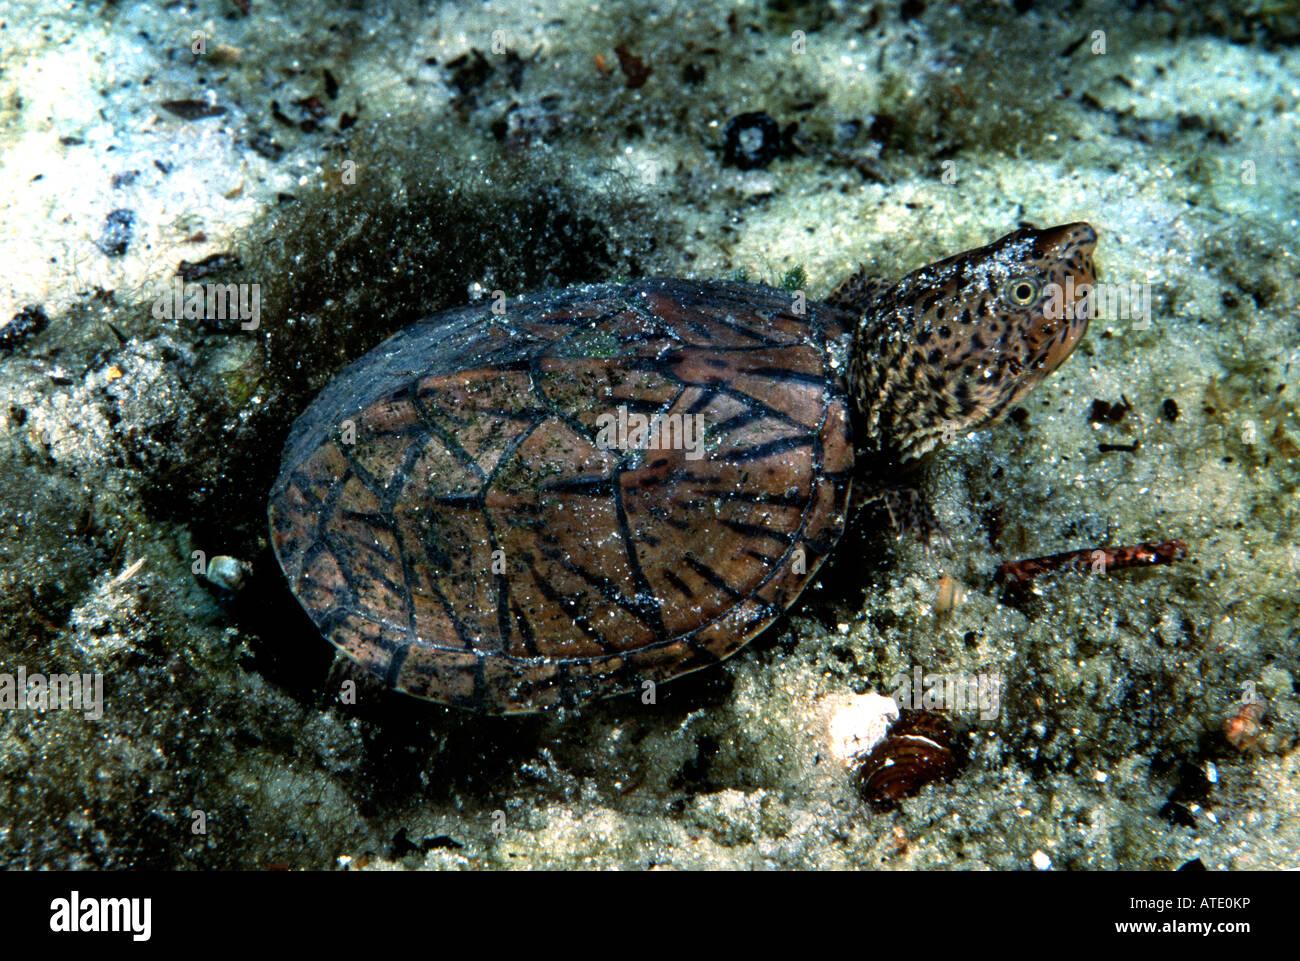 Florida snapping Turtle Chelydra serpentina osceola Rainbow Springs Florida USA - Stock Image